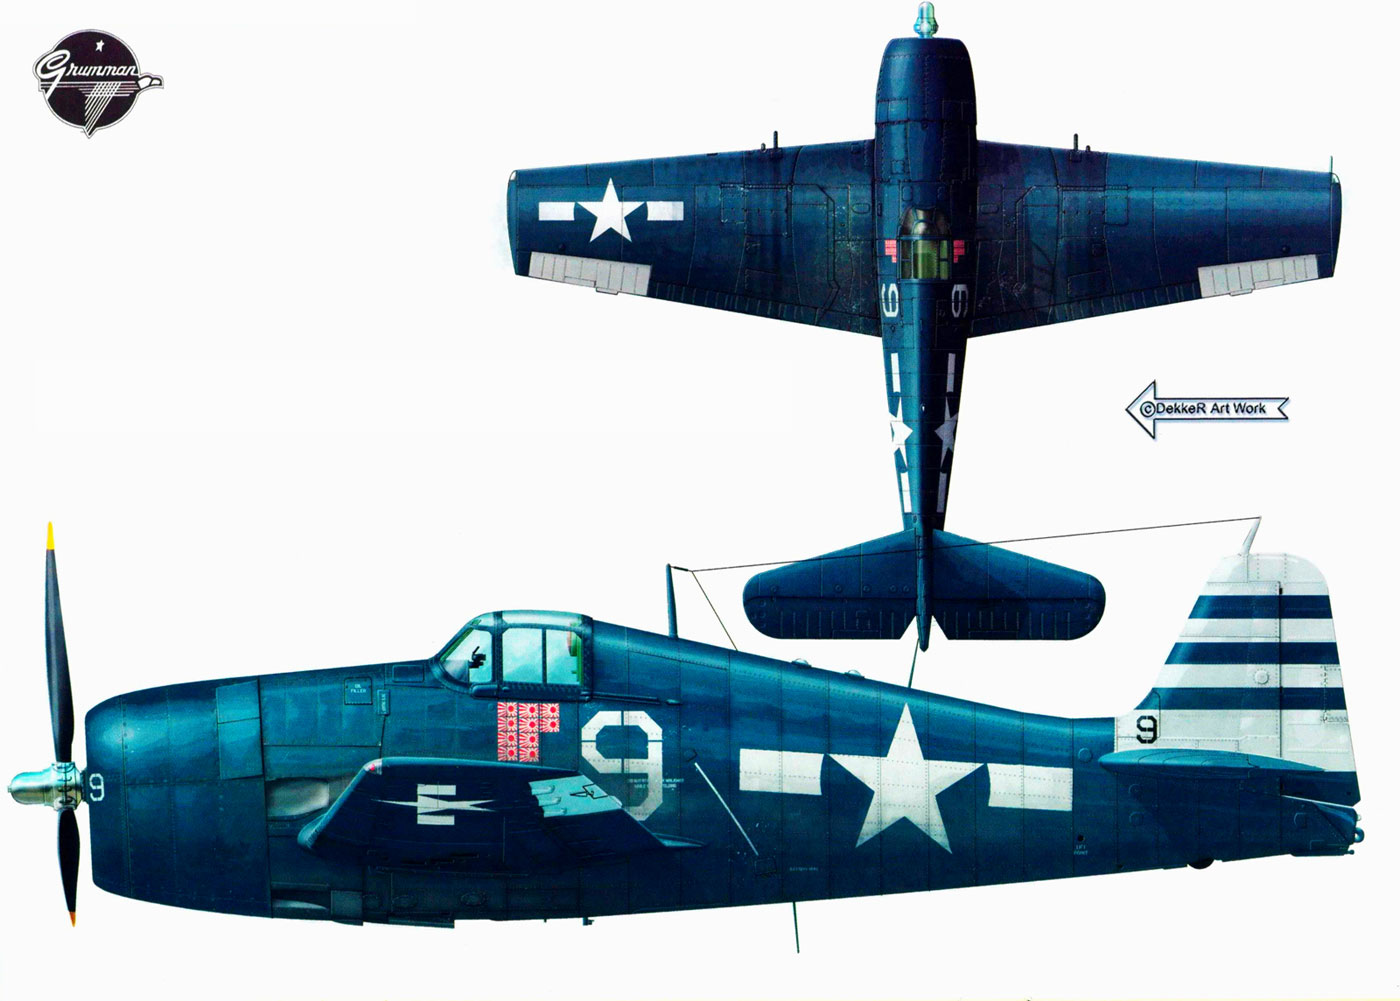 Grumman F6F 5 Hellcat VF 12 White 9 Lt Hamilton McWhorter CV 15 USS Randolph May 1945 0A